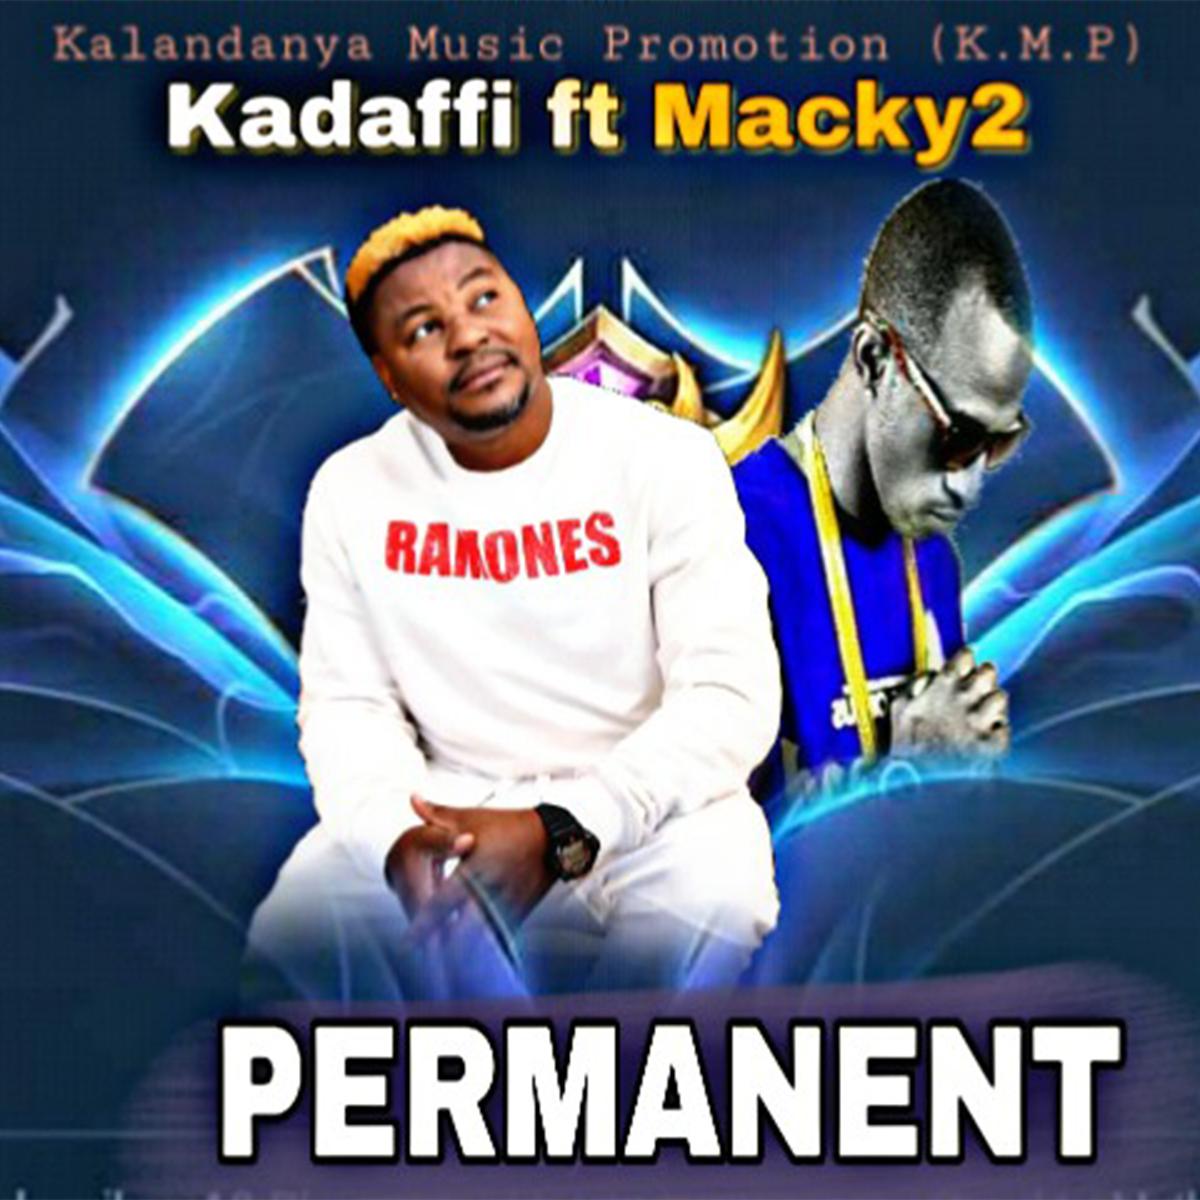 Kadaffi ft. Macky 2 - Permanent